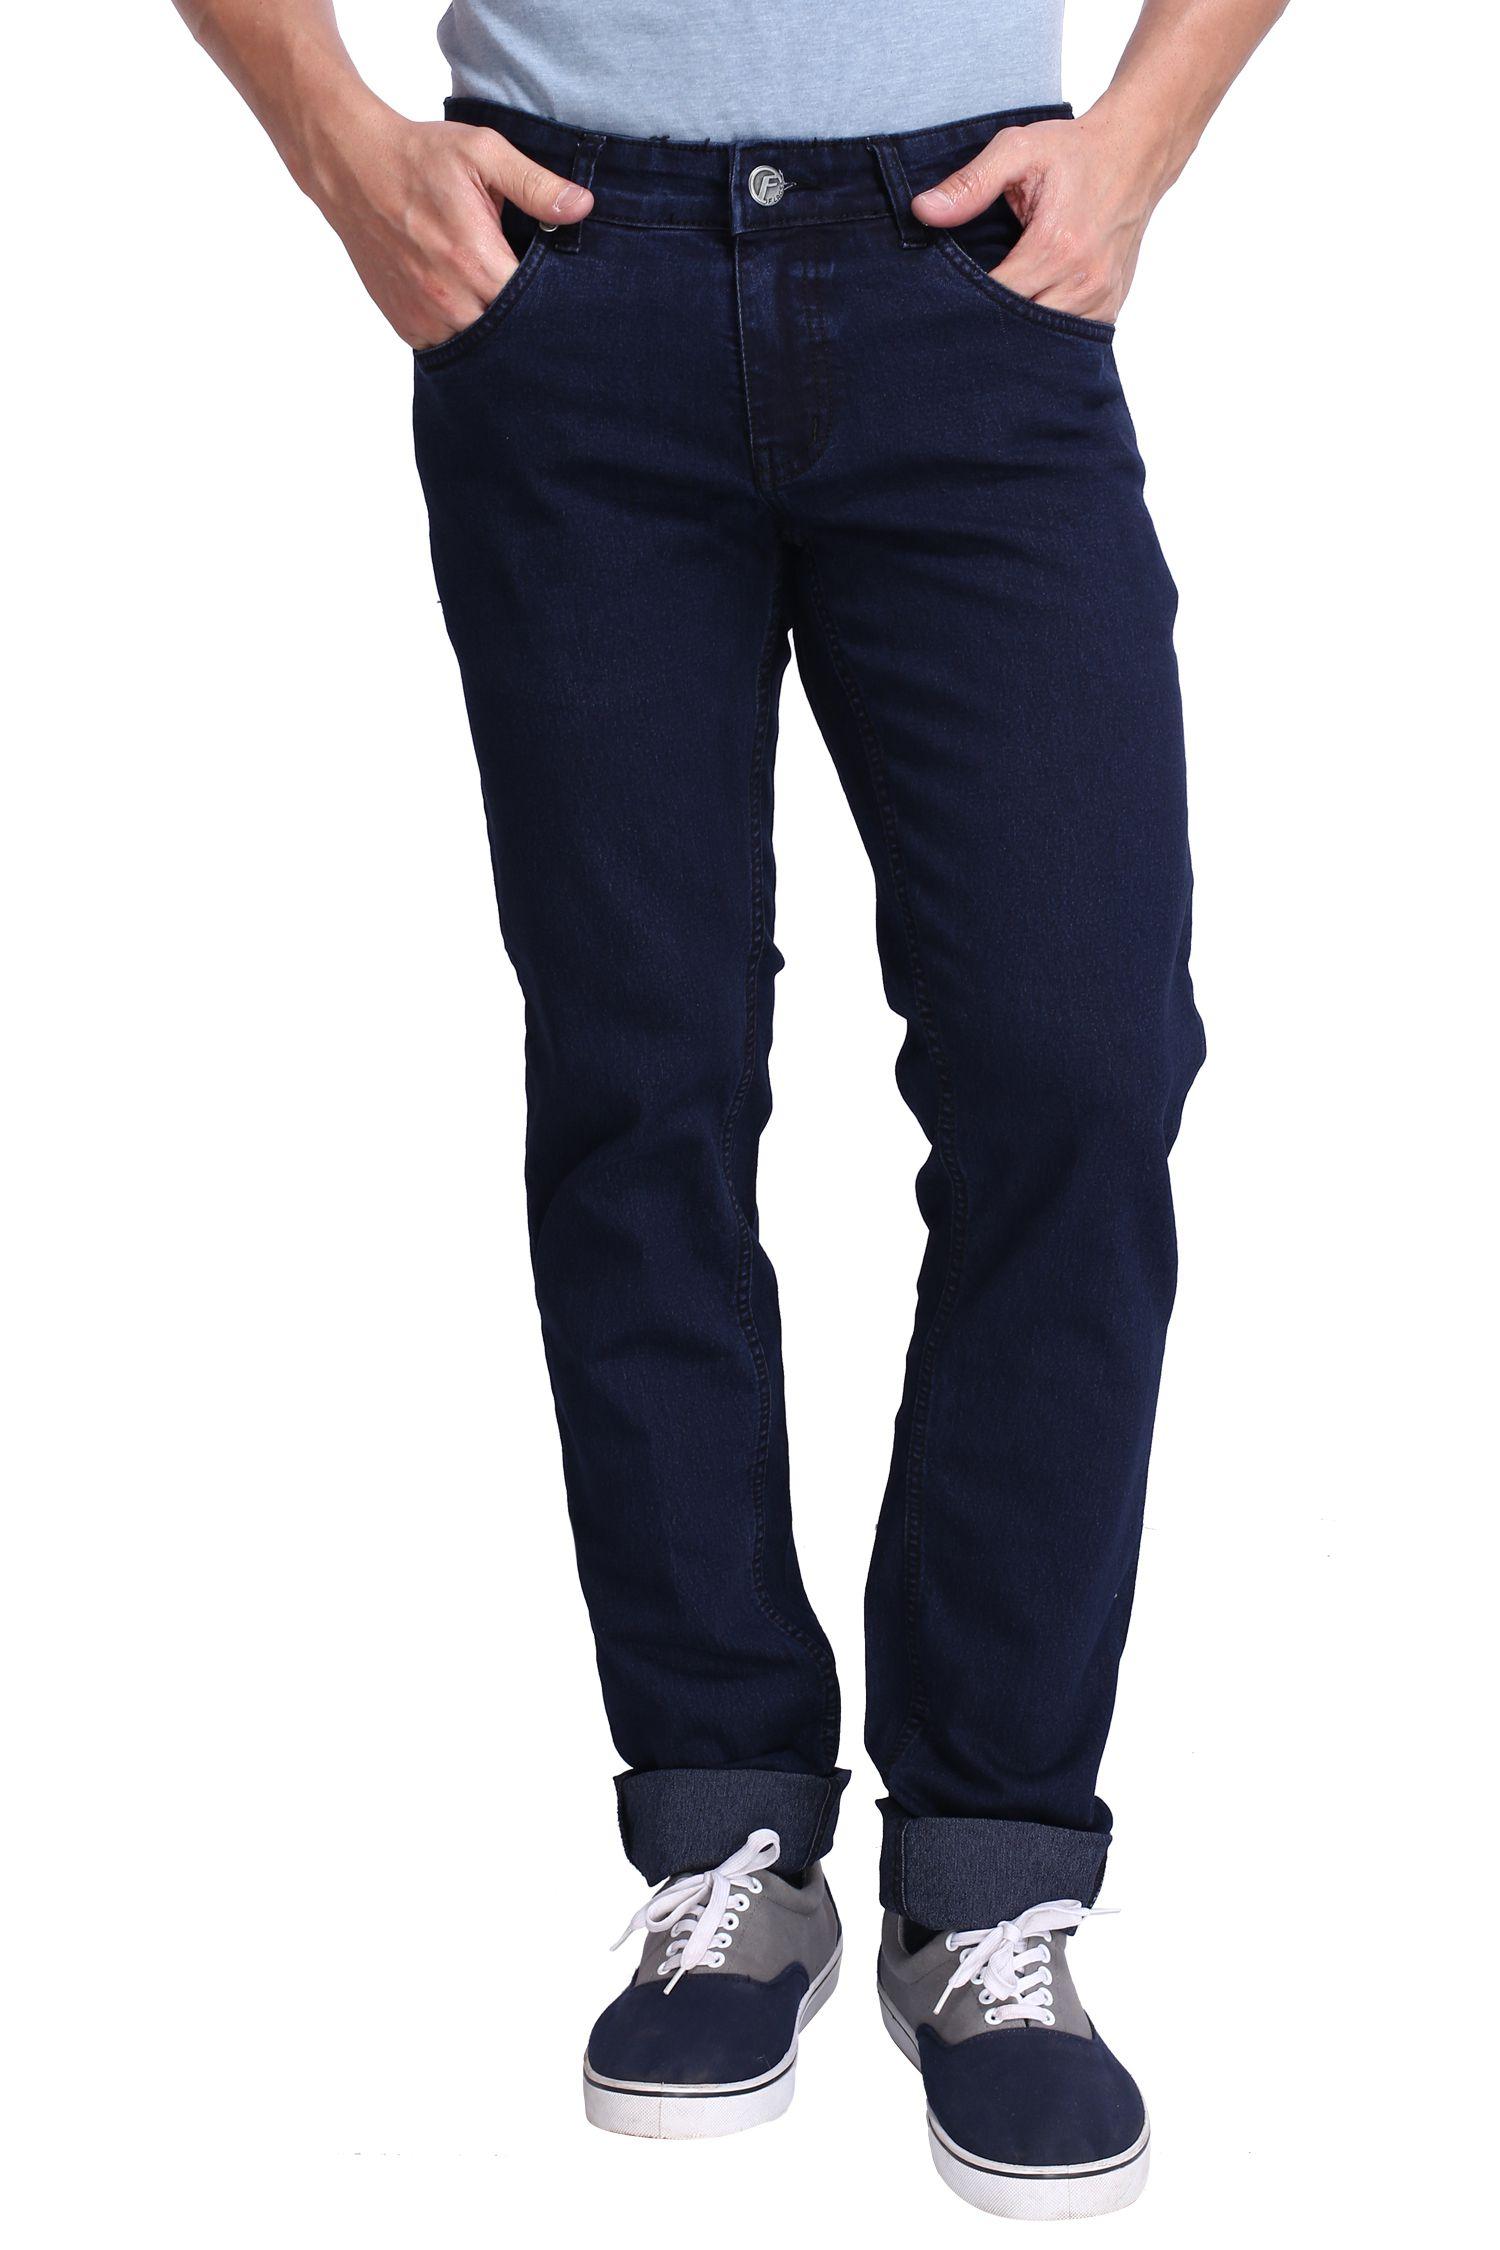 Flags Blue Slim Jeans